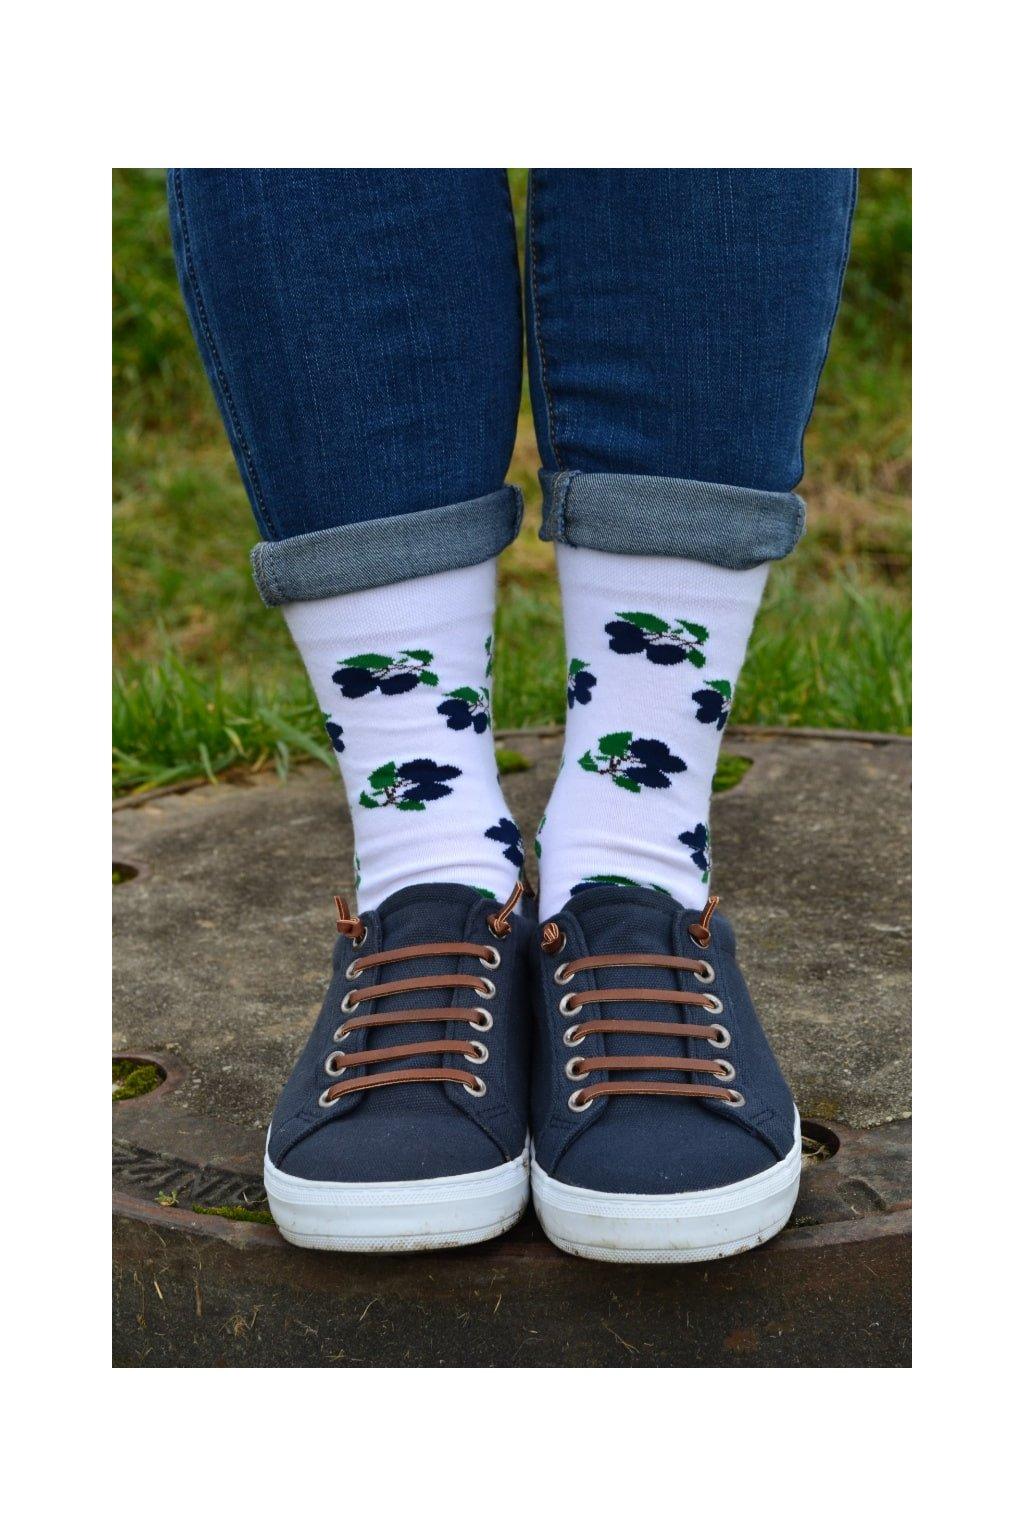 Ponožky se švestkama a slivovicí